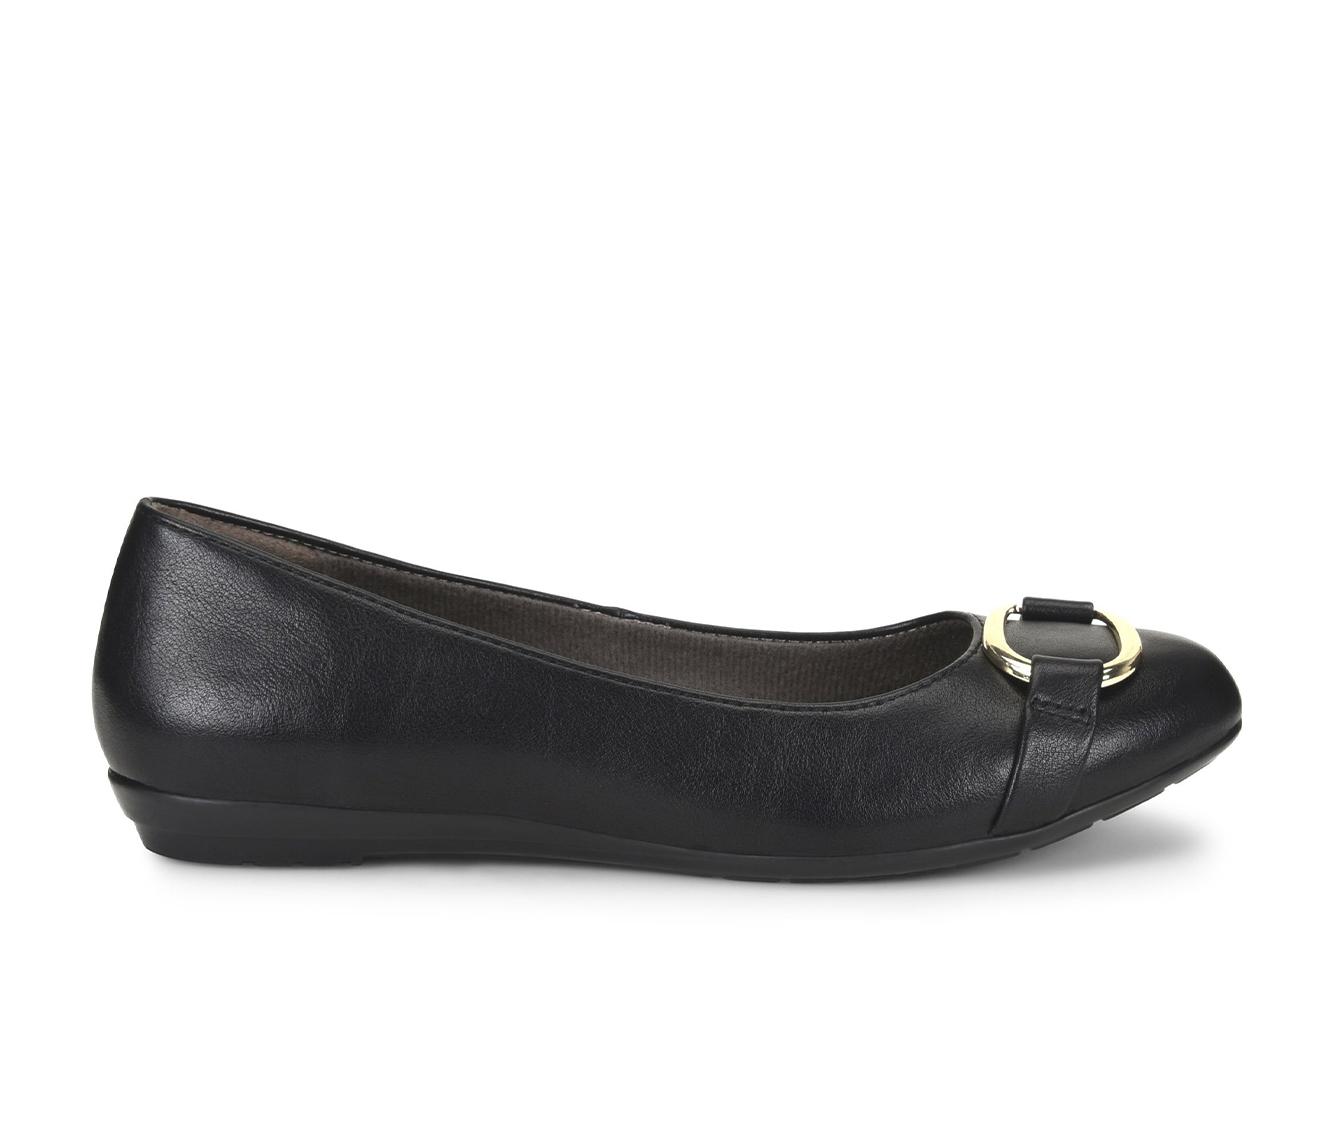 EuroSoft Beverly Women's Shoe (Black Faux Leather)